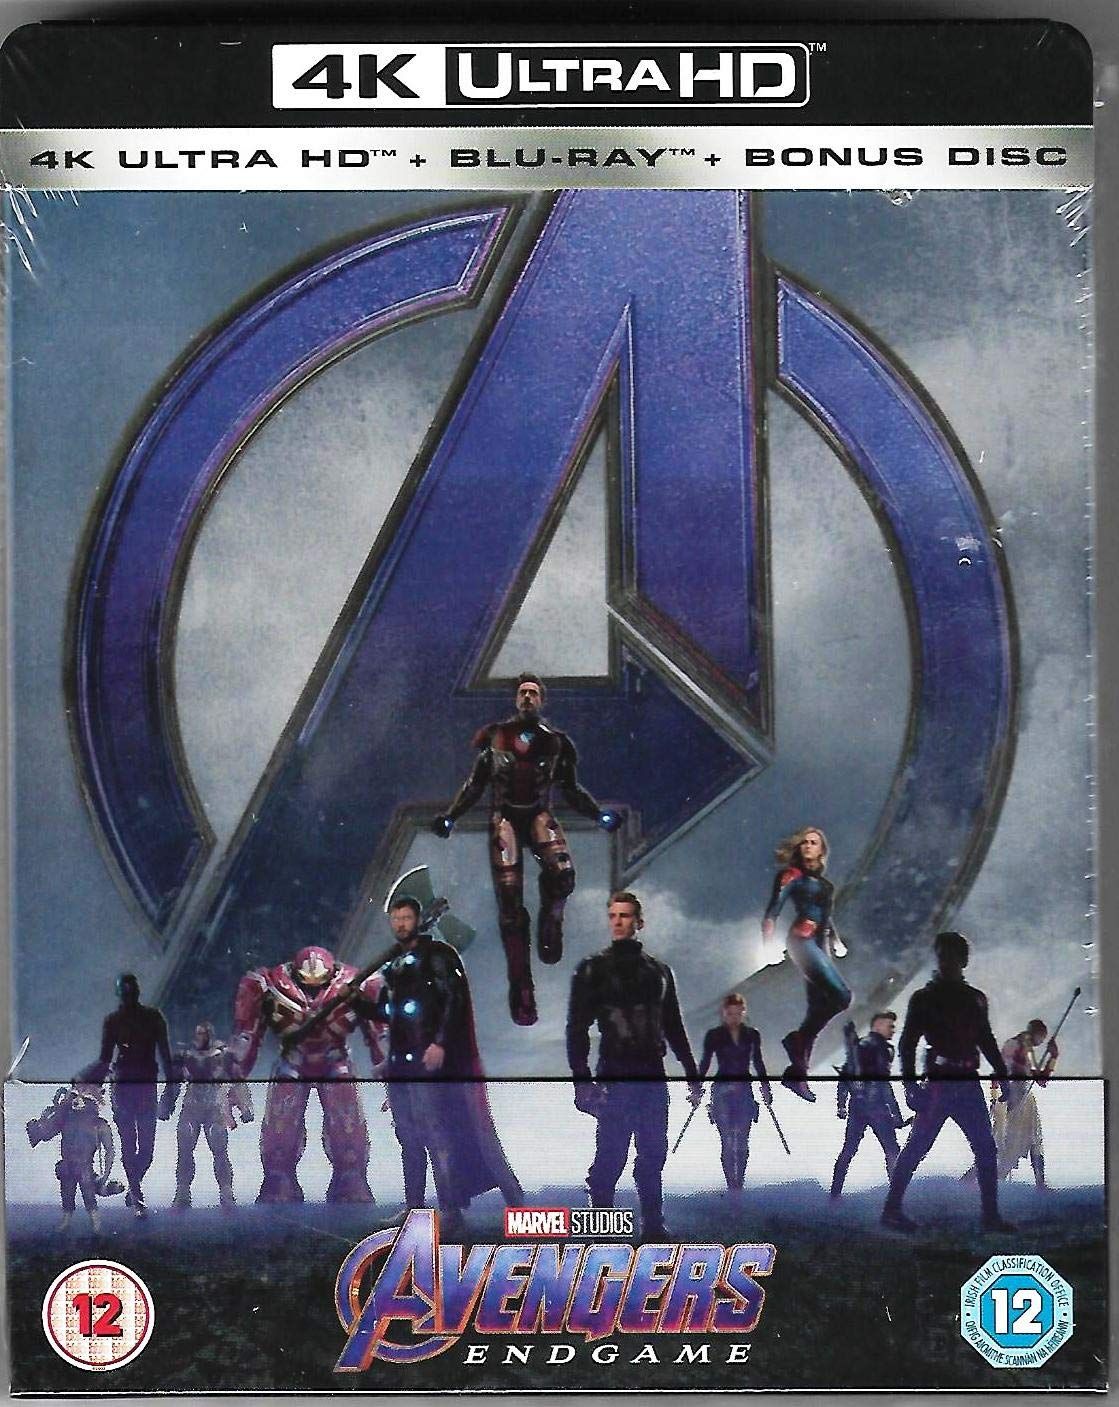 Avengers Endgame 4K Ultra HD Limited Edition Steelbook / Import / Includes 2D Region Free Blu Ray: Amazon.es: Cine y Series TV